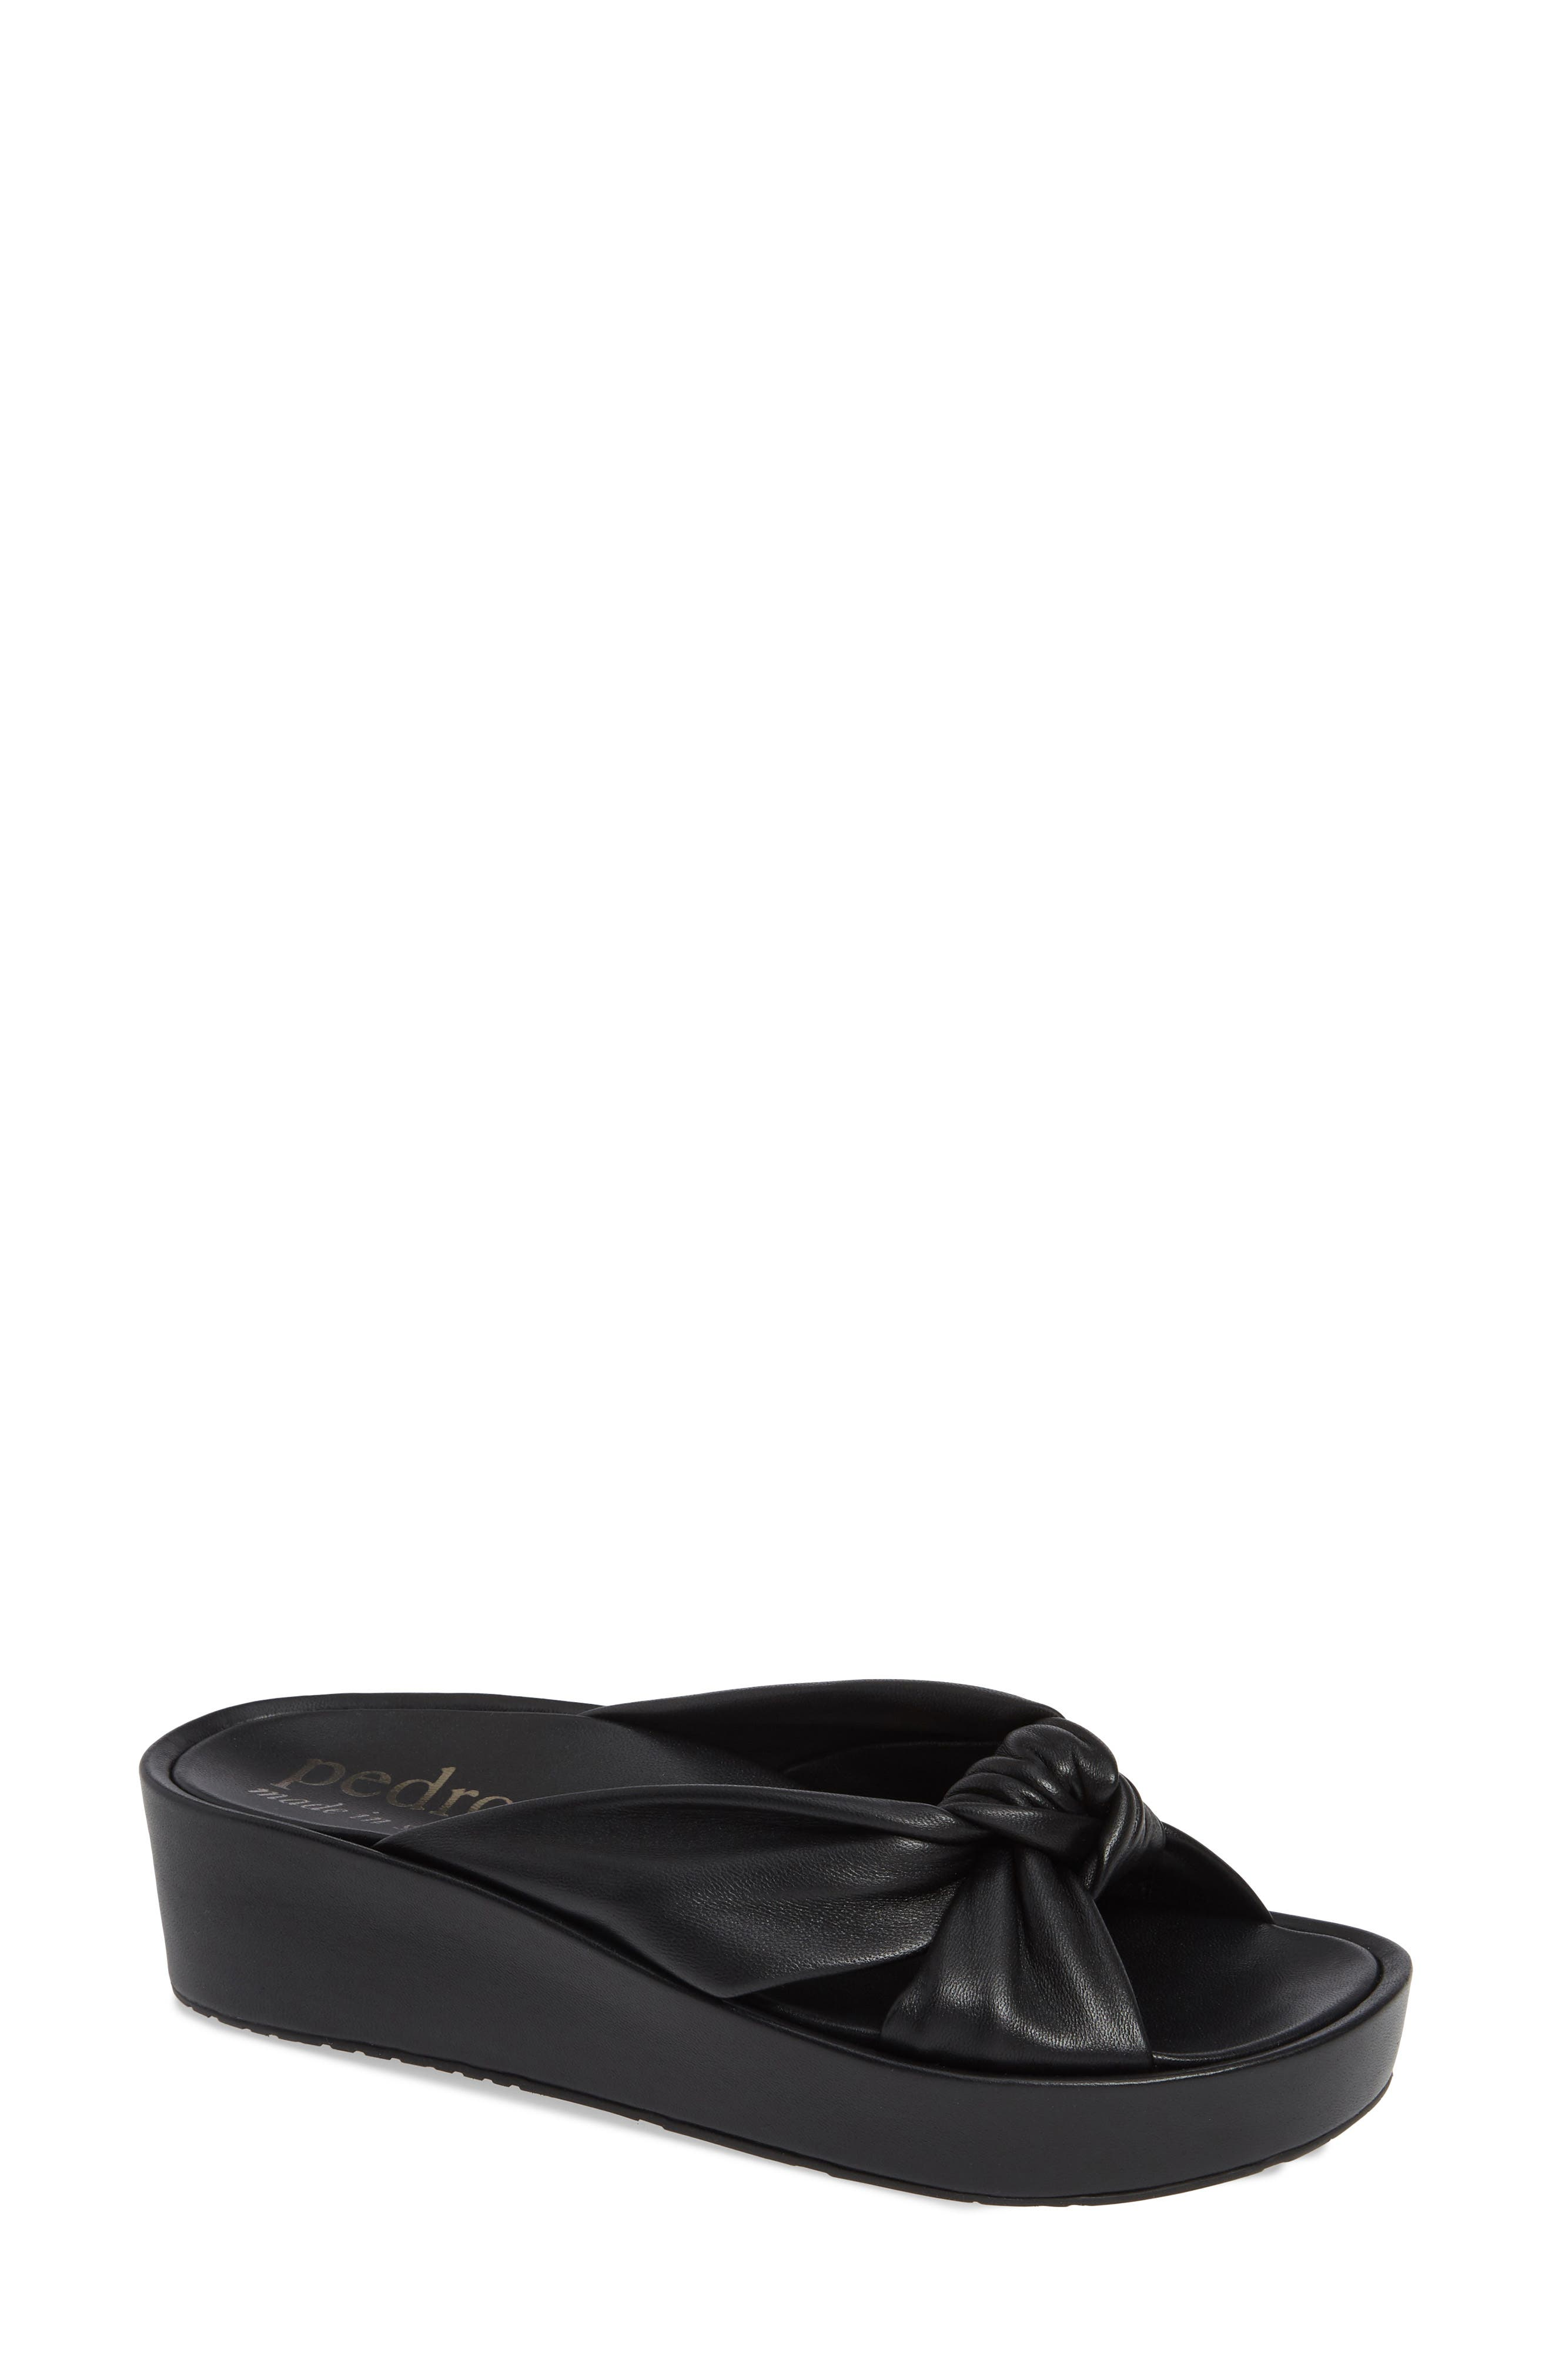 PEDRO GARCIA, Lany Platform Slide Sandal, Main thumbnail 1, color, BLACK LEATHER